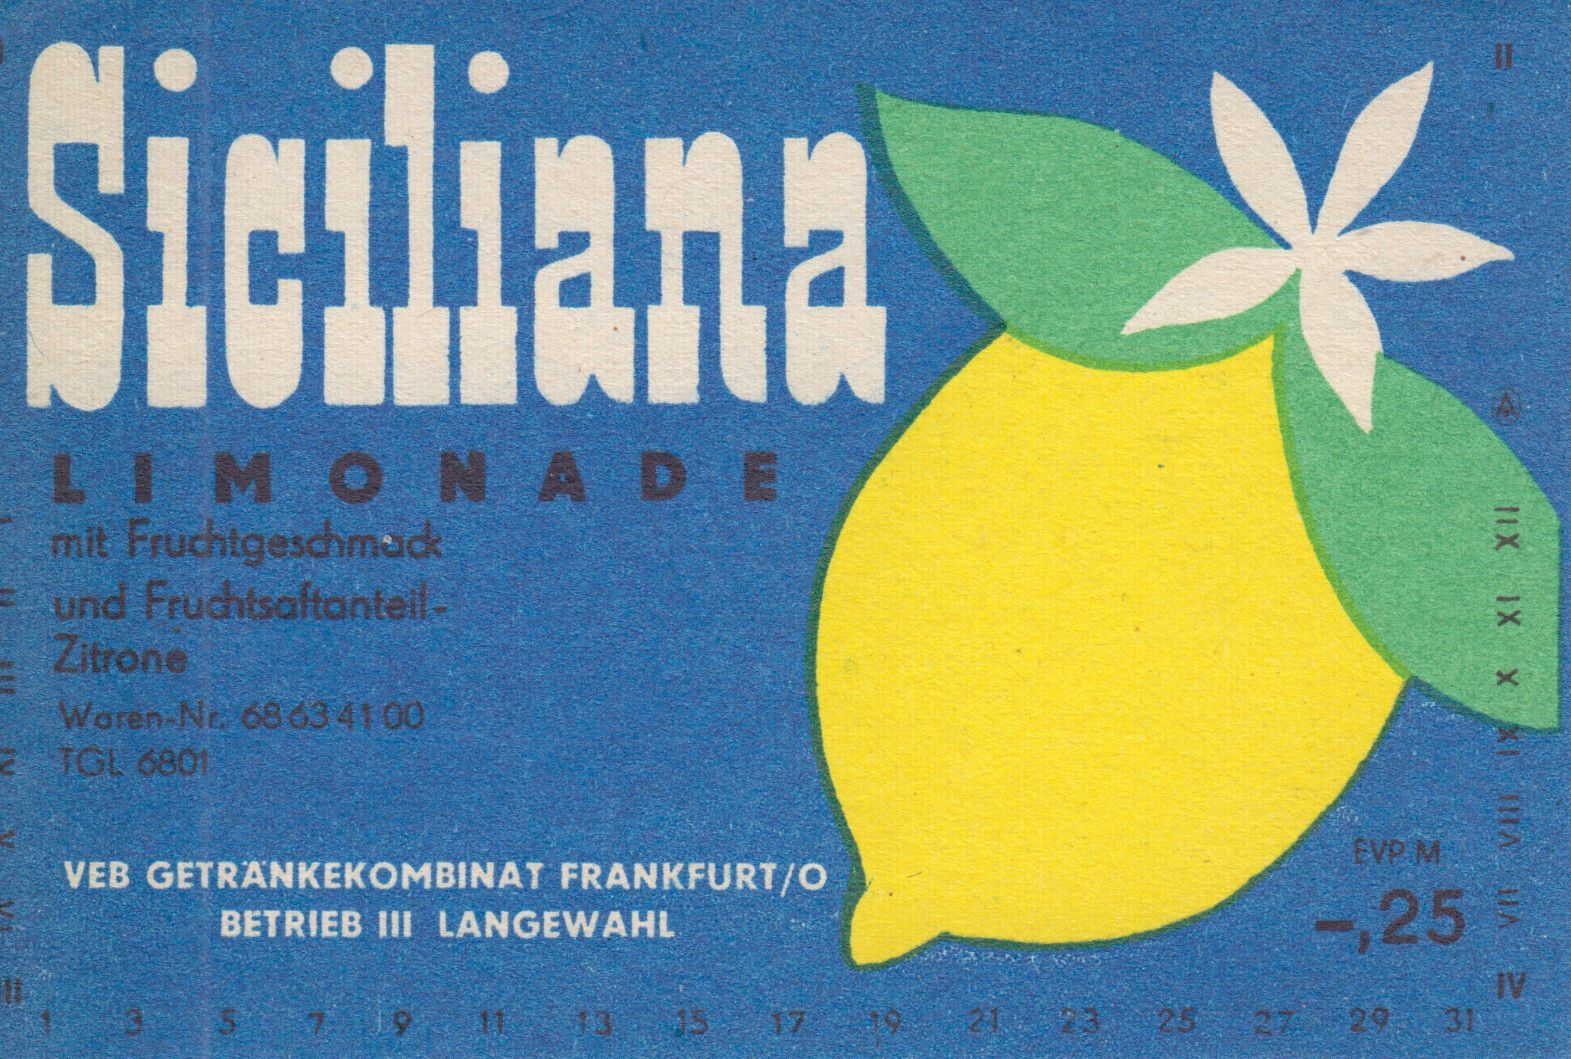 Siciliana Limonade, VEB Getränkekombinat Frankfurt/O. (Bild: historisches Etikett)